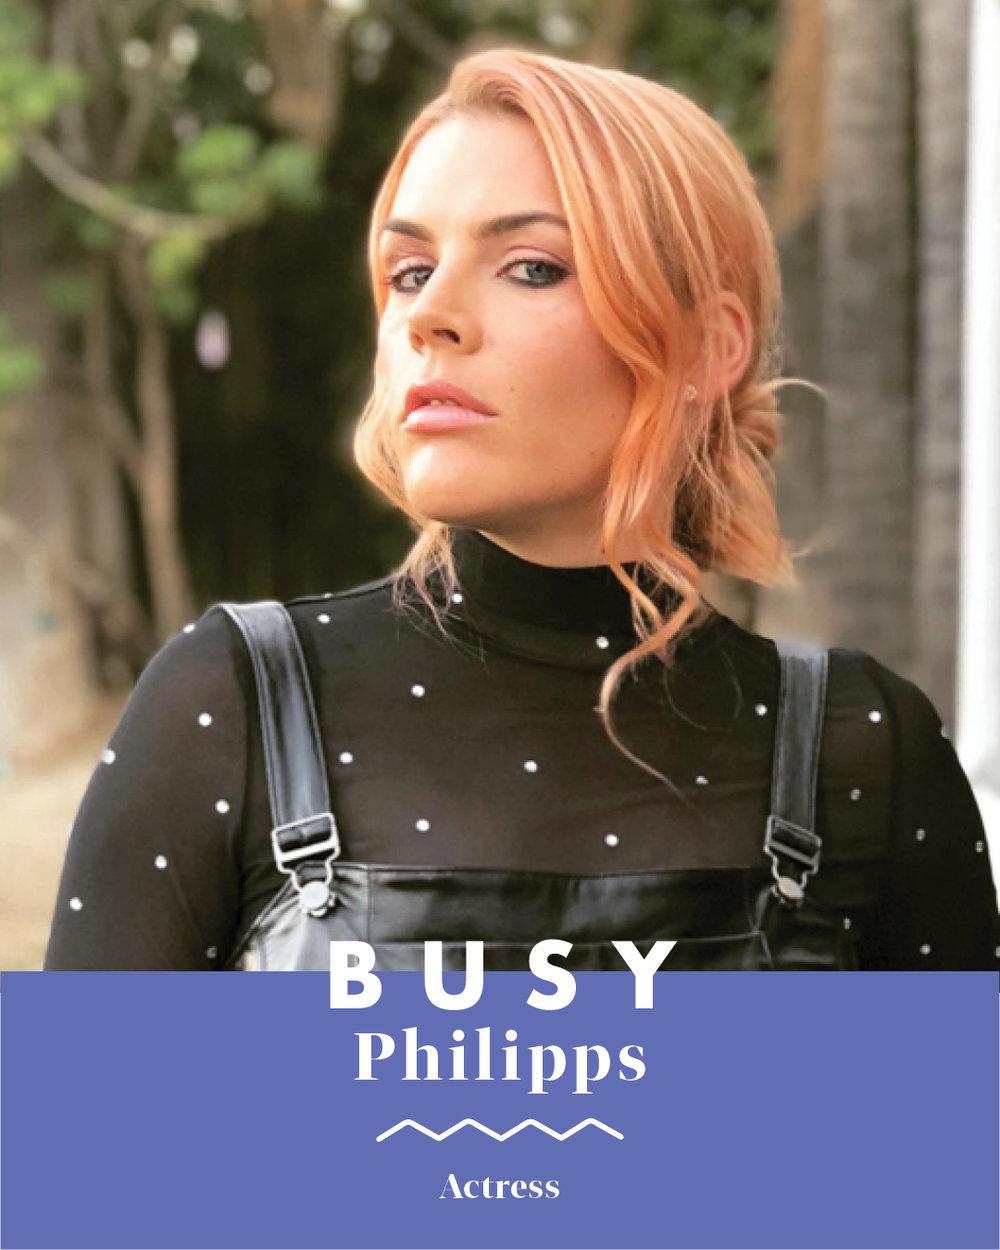 busy-philipps.jpg